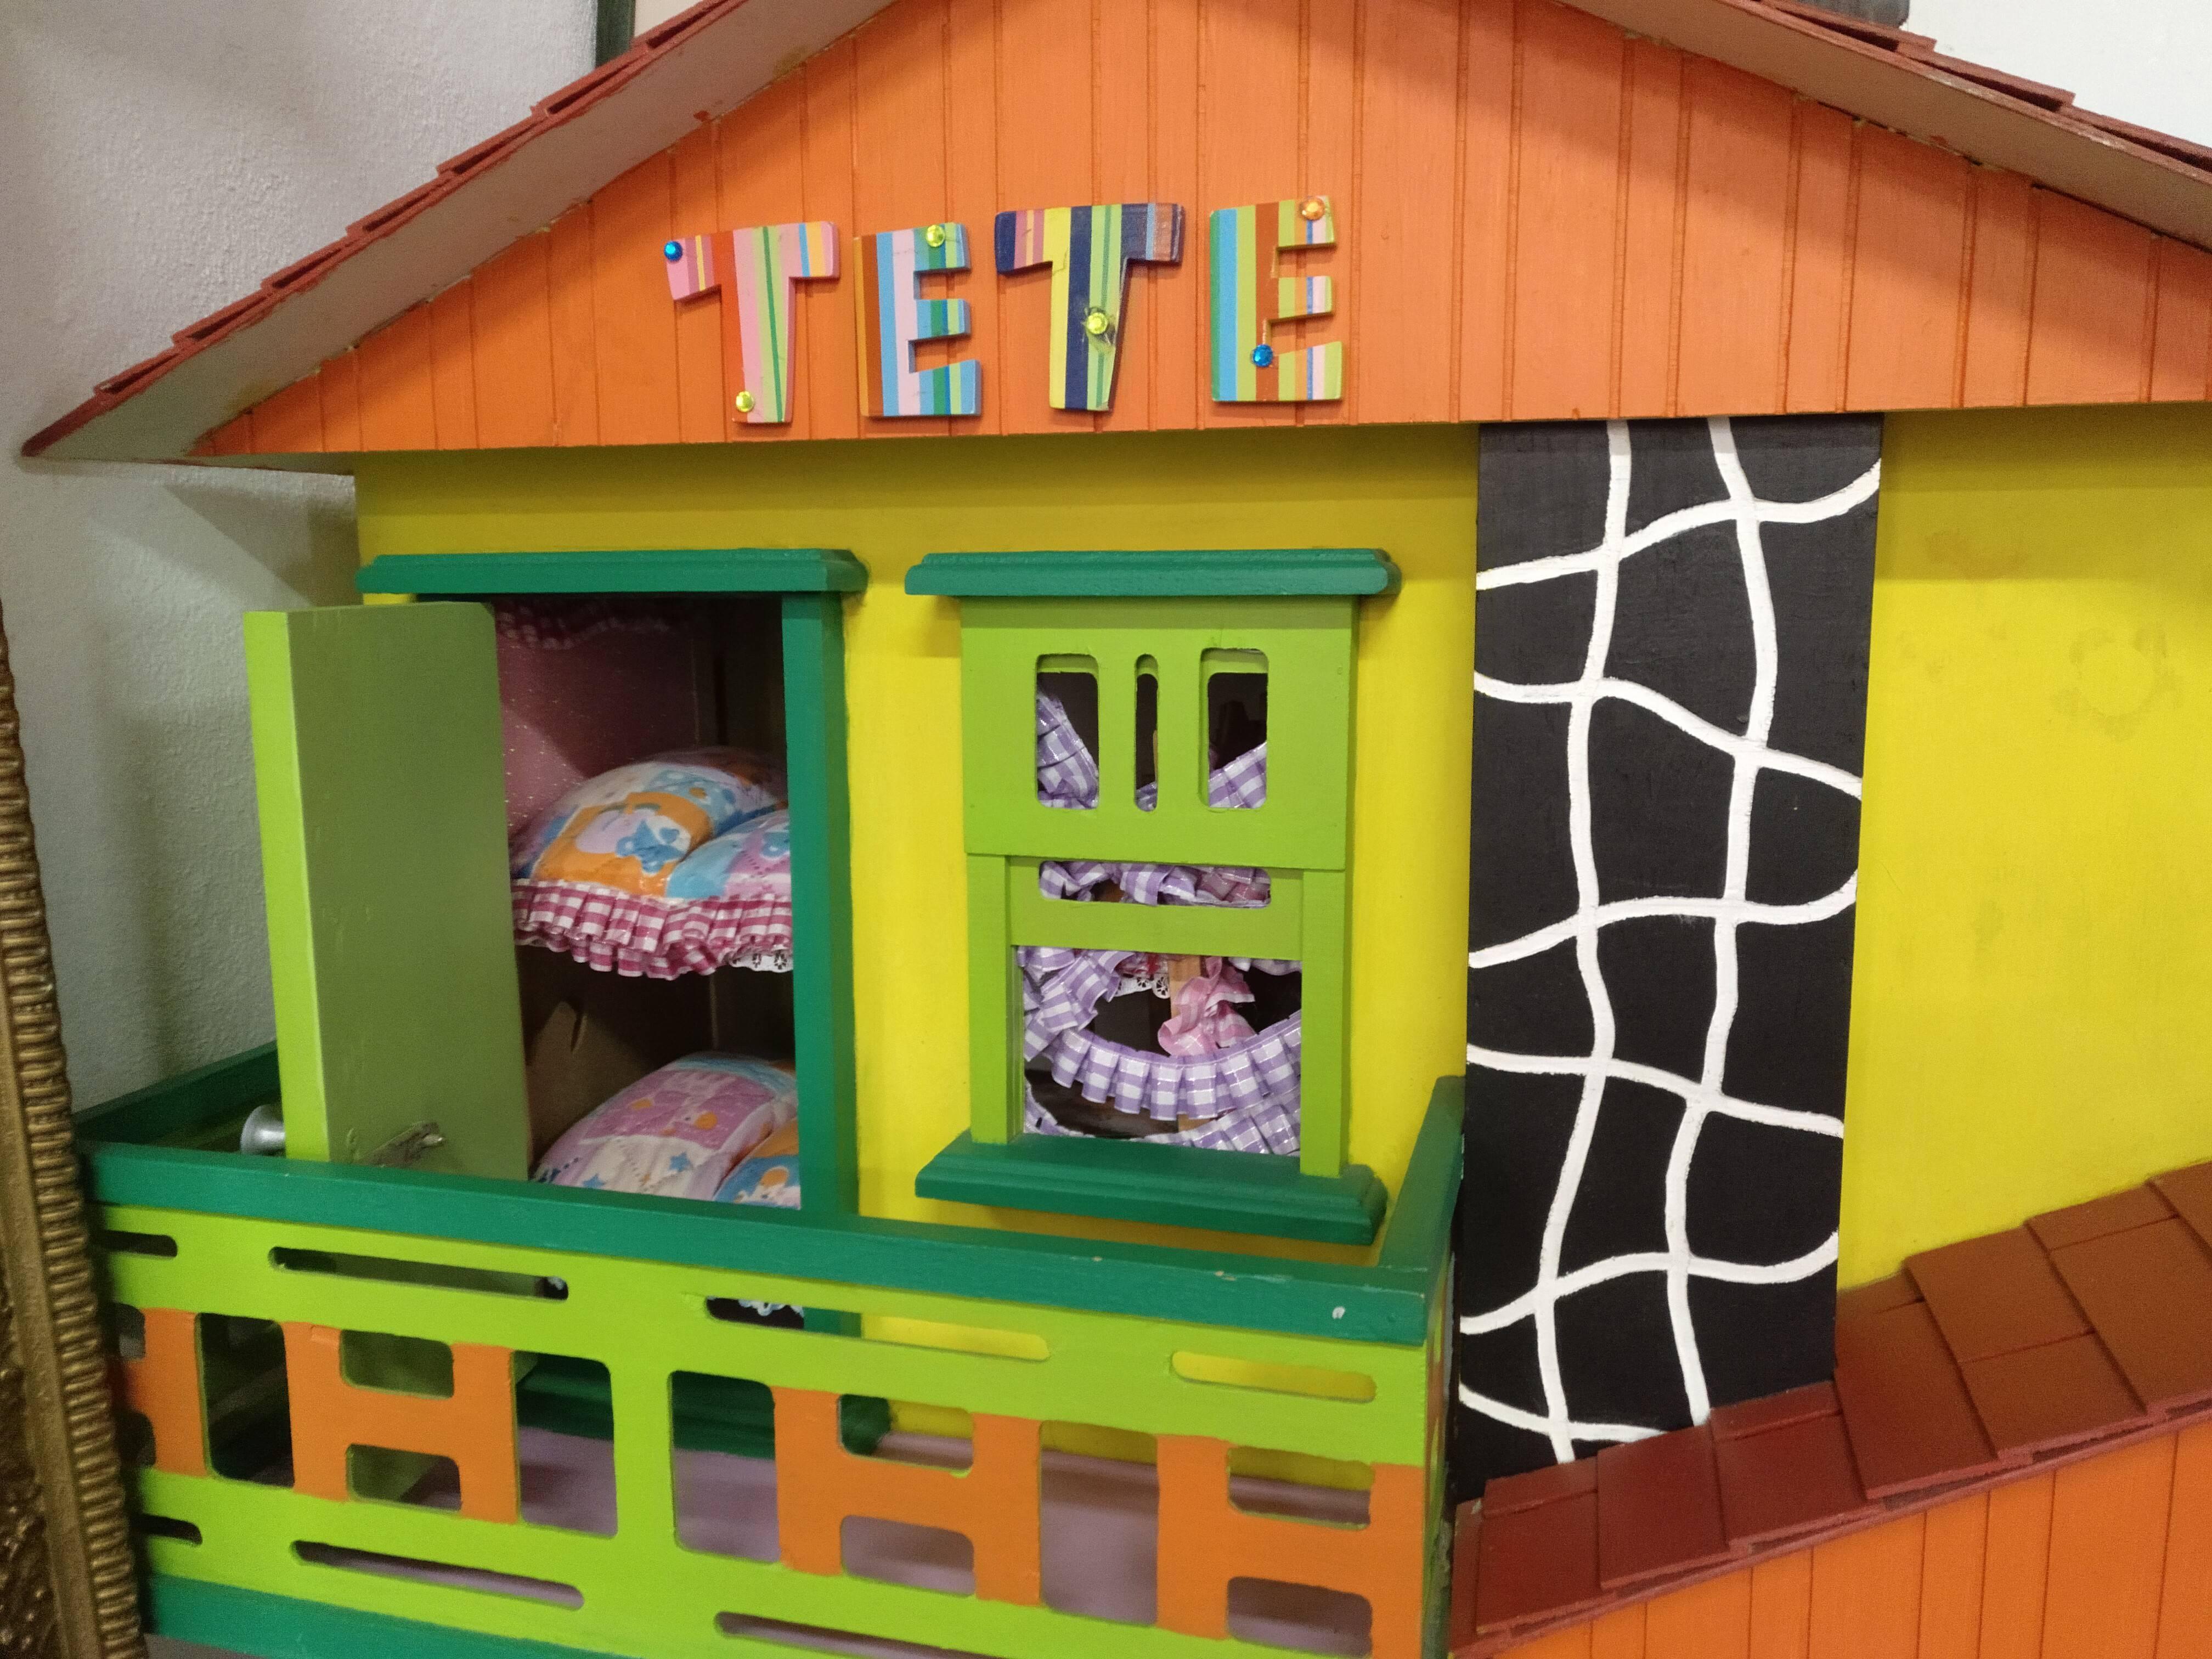 Casa de madera hecha a mano 3